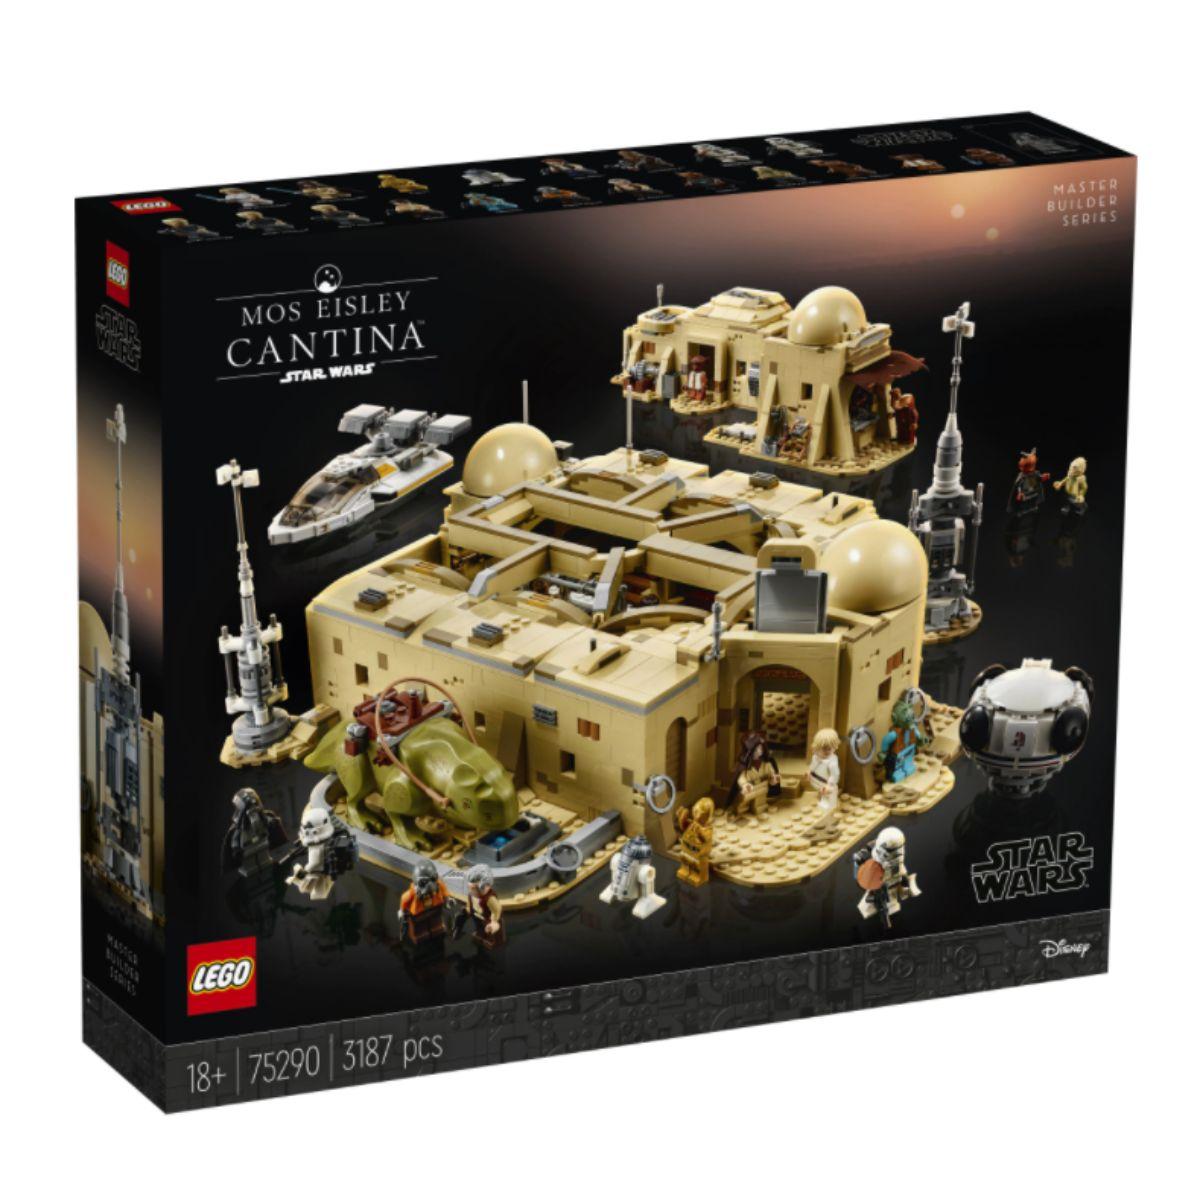 LEGO® Star Wars - Mos Eisley Cantina (75290)